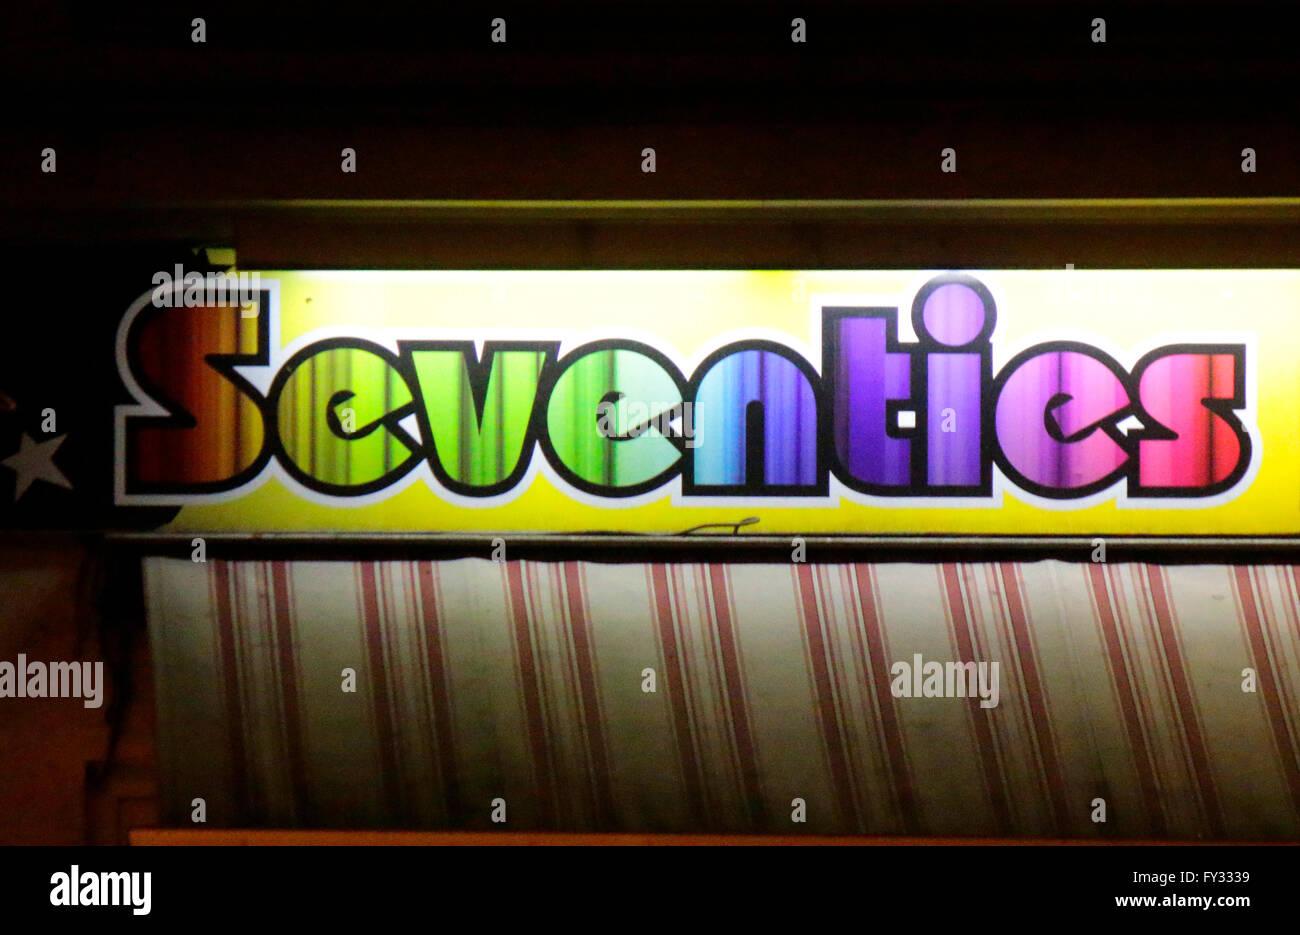 Markennamen: 'Seventies', Berlin. - Stock Image